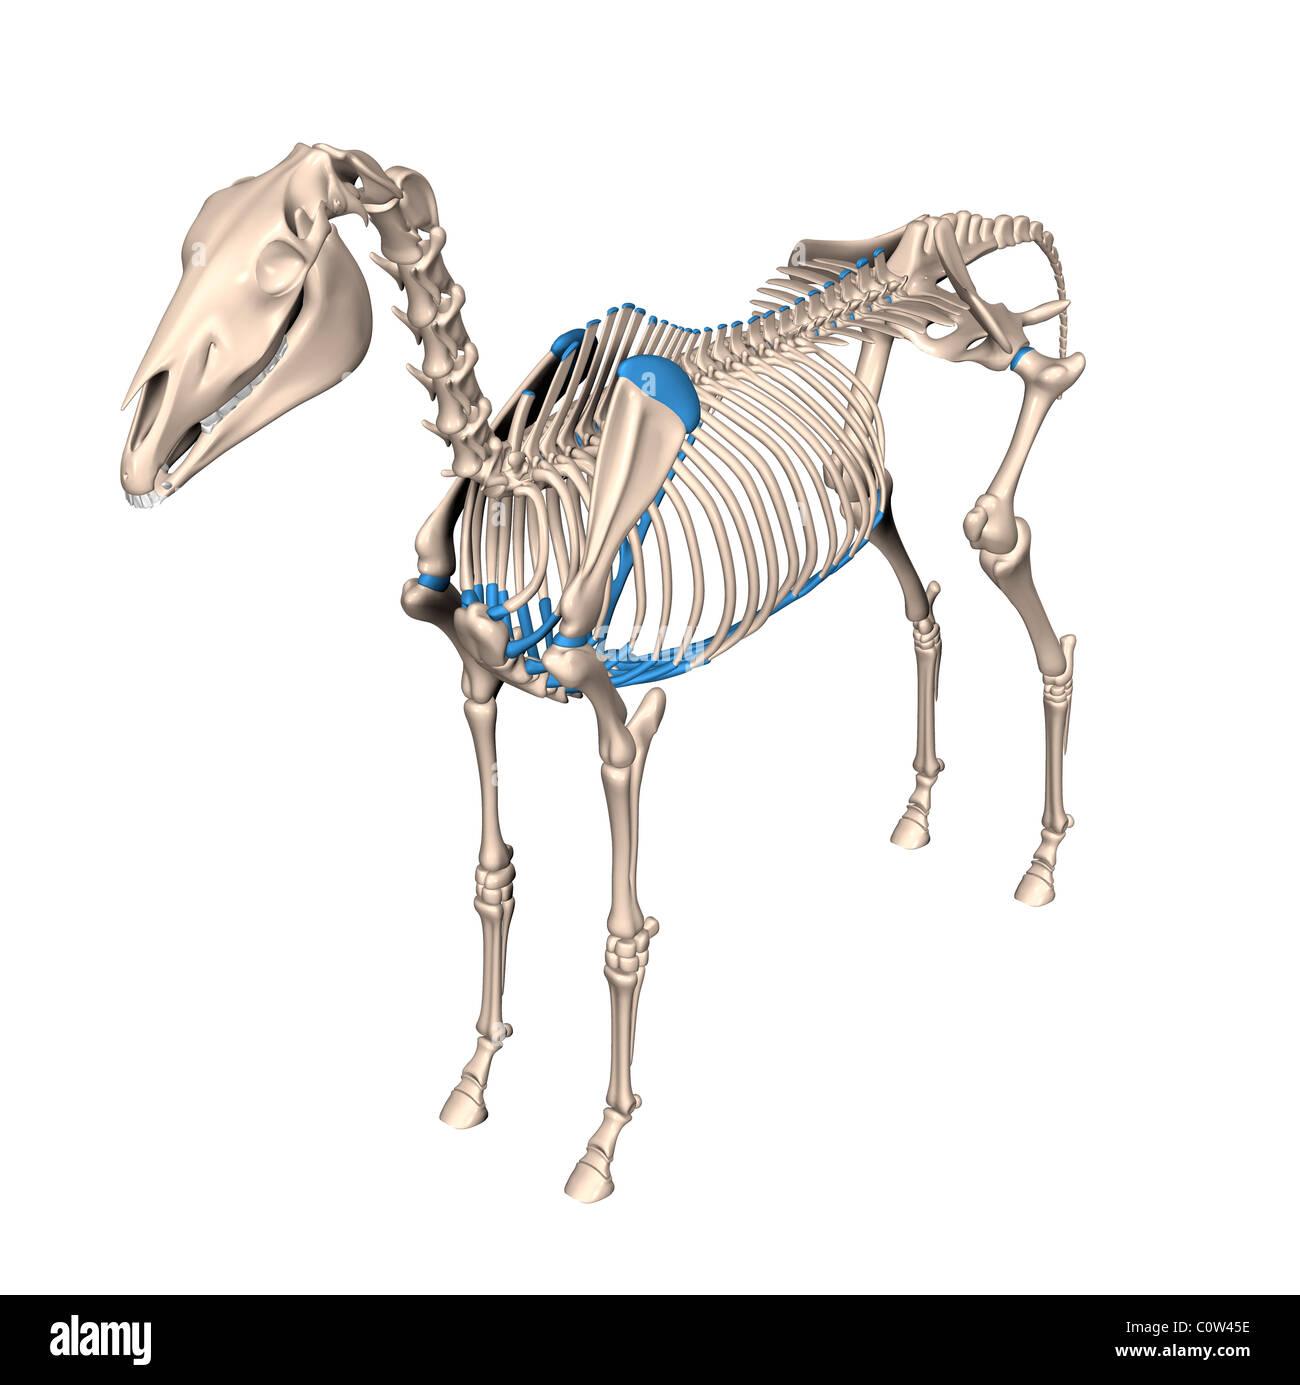 Horse Skeleton Stock Photos & Horse Skeleton Stock Images - Alamy